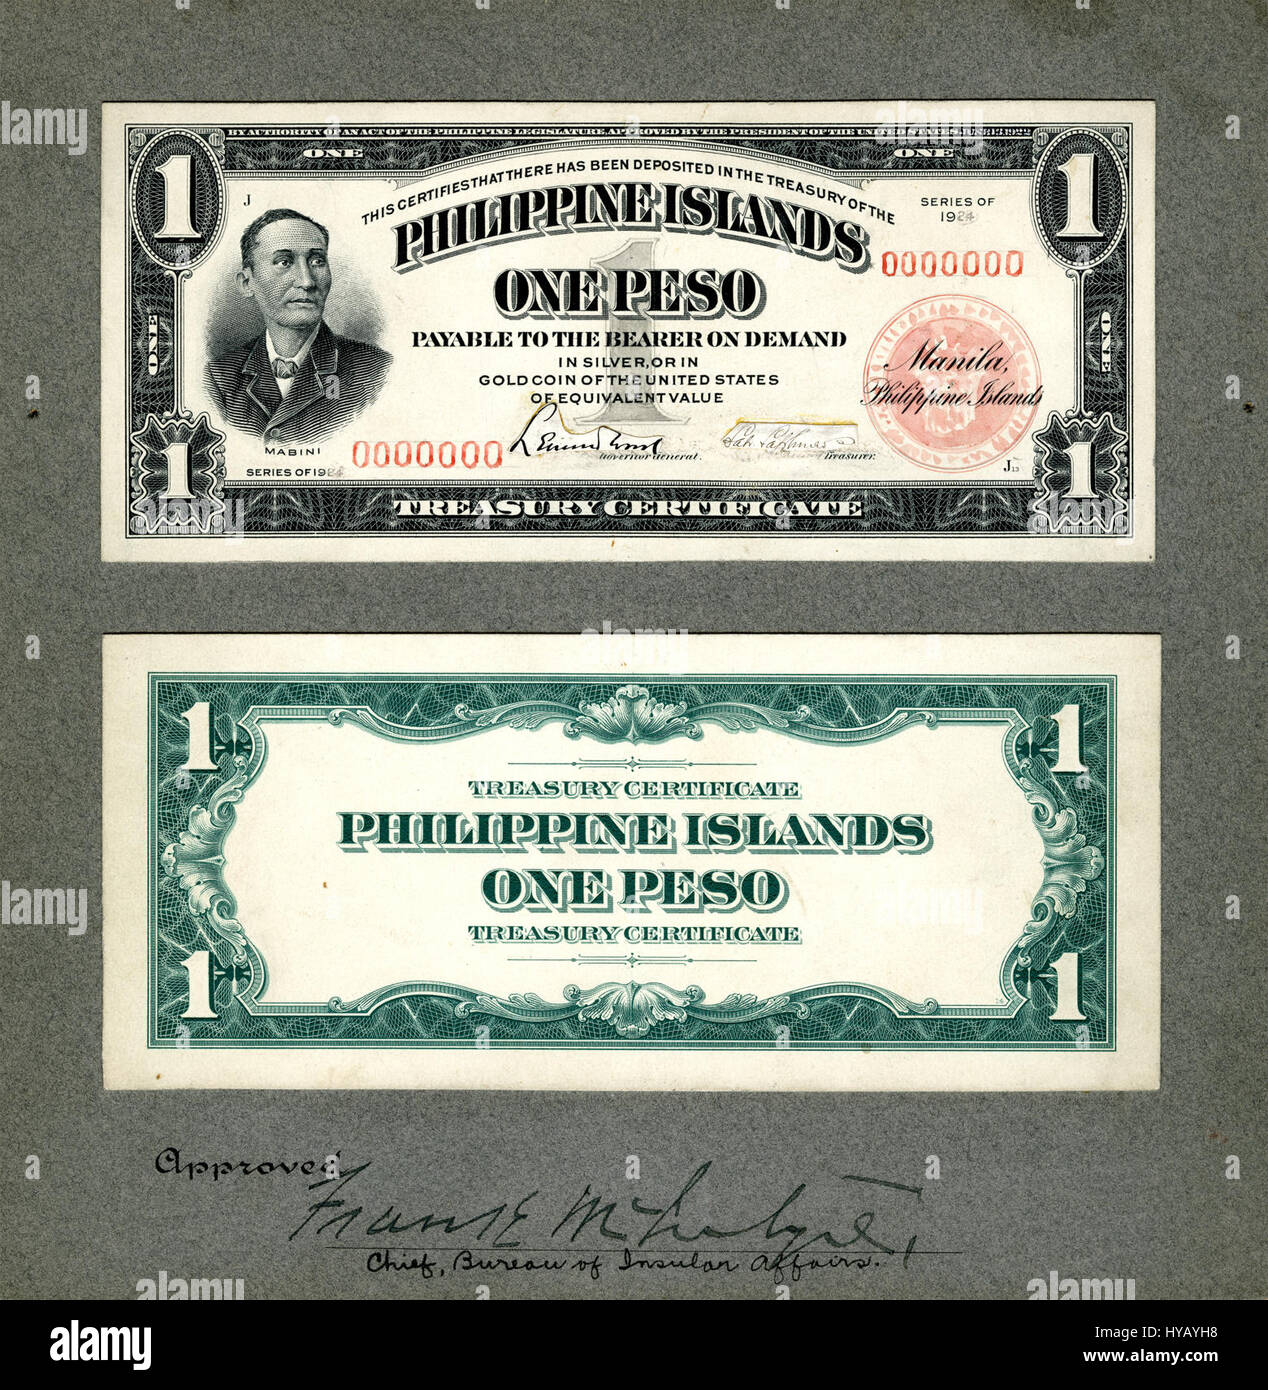 certificate treasury peso philippine 1924 phi 68c islands alamy proof